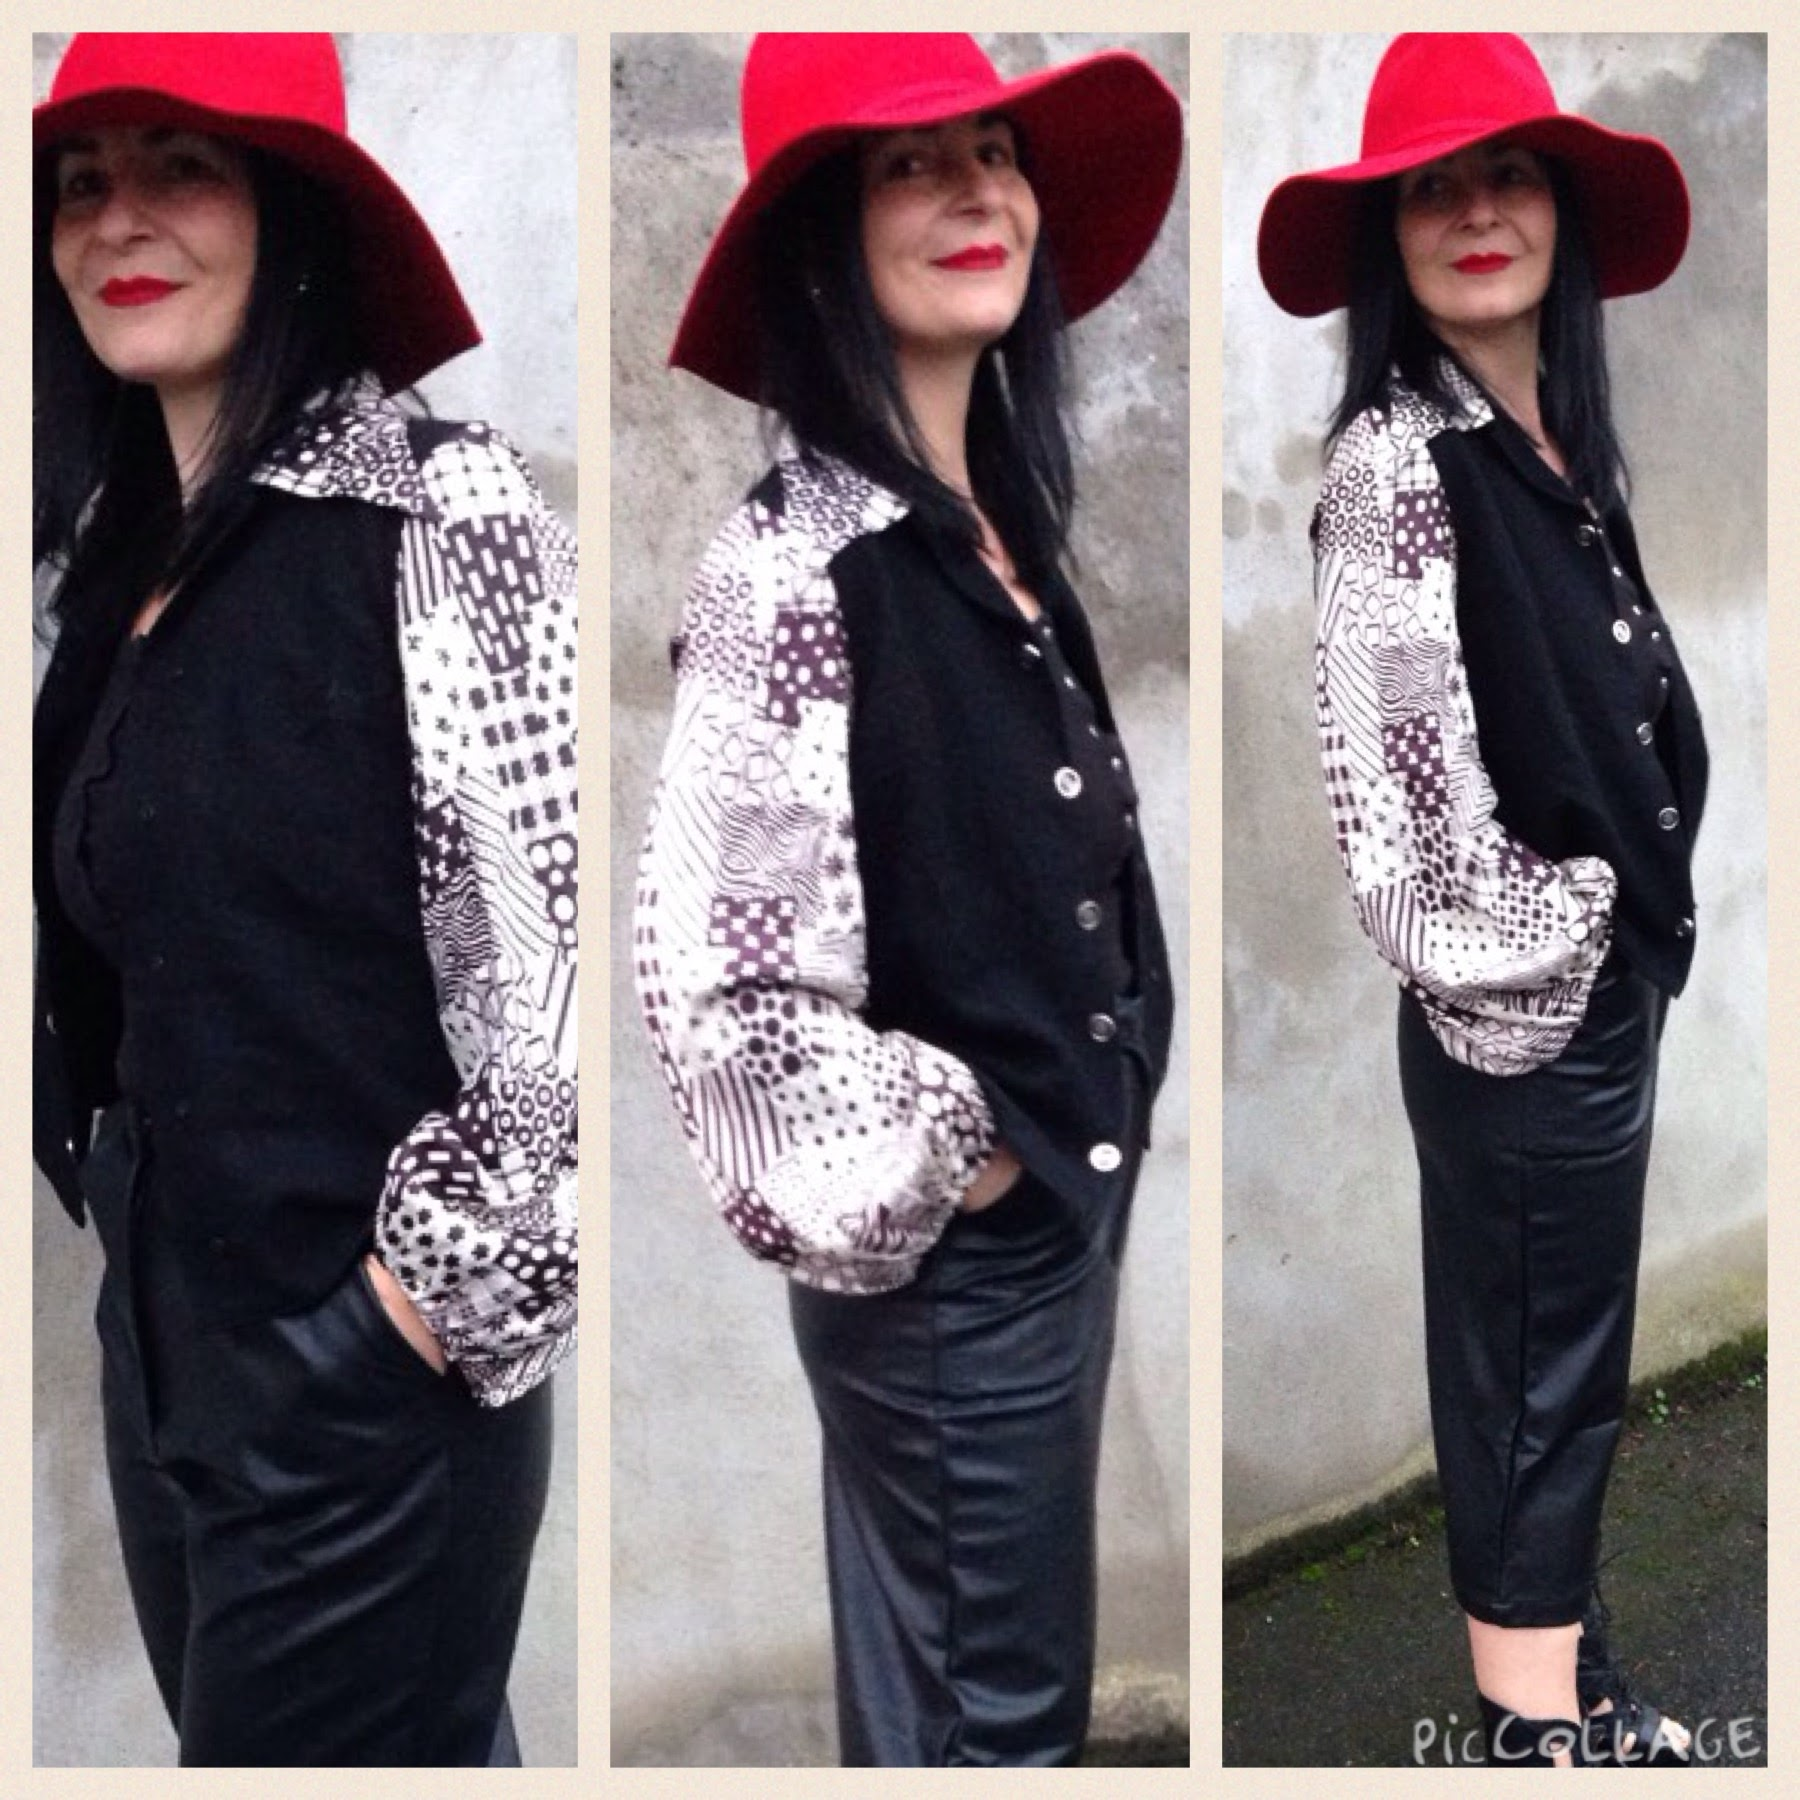 Gorgeous 70s black wool and satin sleeved monochrome printed sleeves. Fab! Tola kilo sale Dublin.